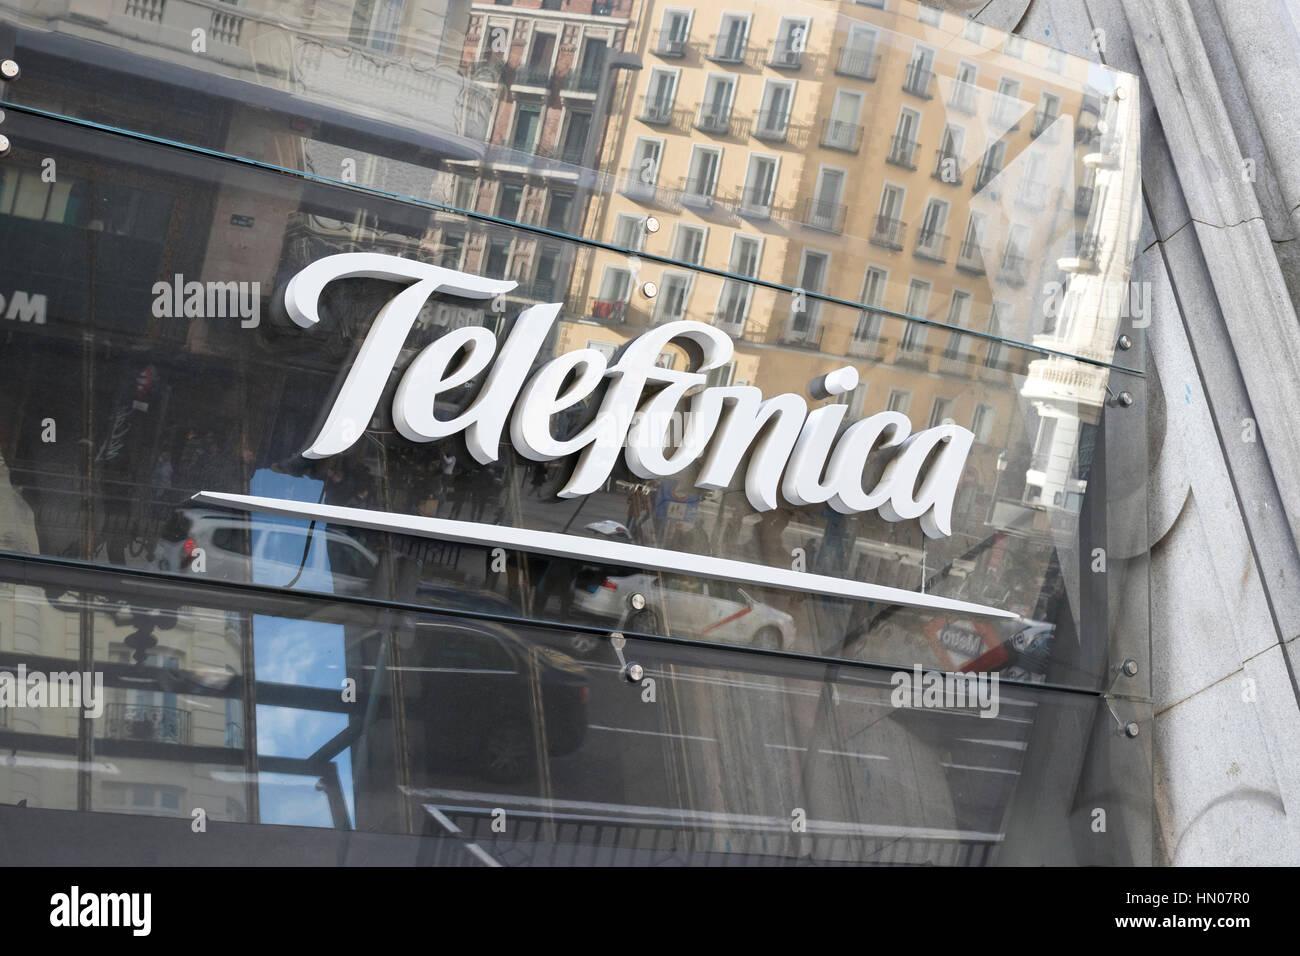 Spanish technology company Telefonica logo - Stock Image